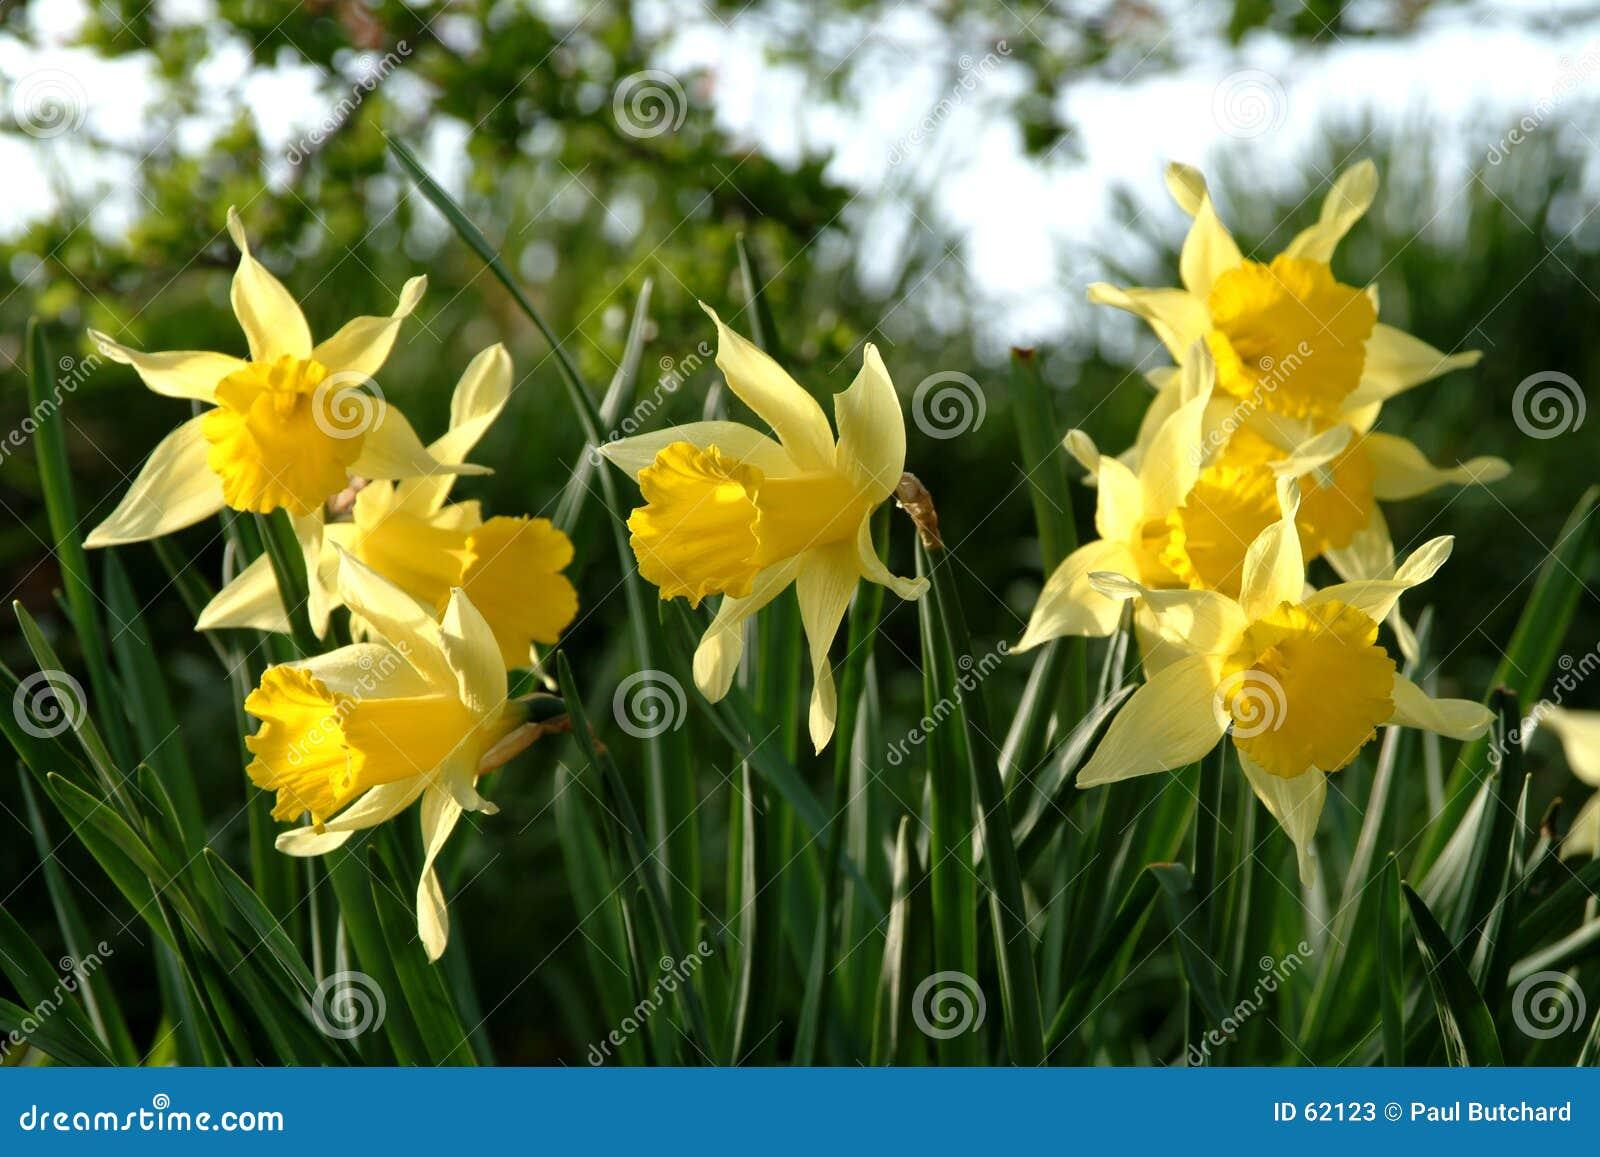 Download Daffodils άνοιξη της Σκωτίας Στοκ Εικόνα - εικόνα από λιβάδι, daffodils: 62123